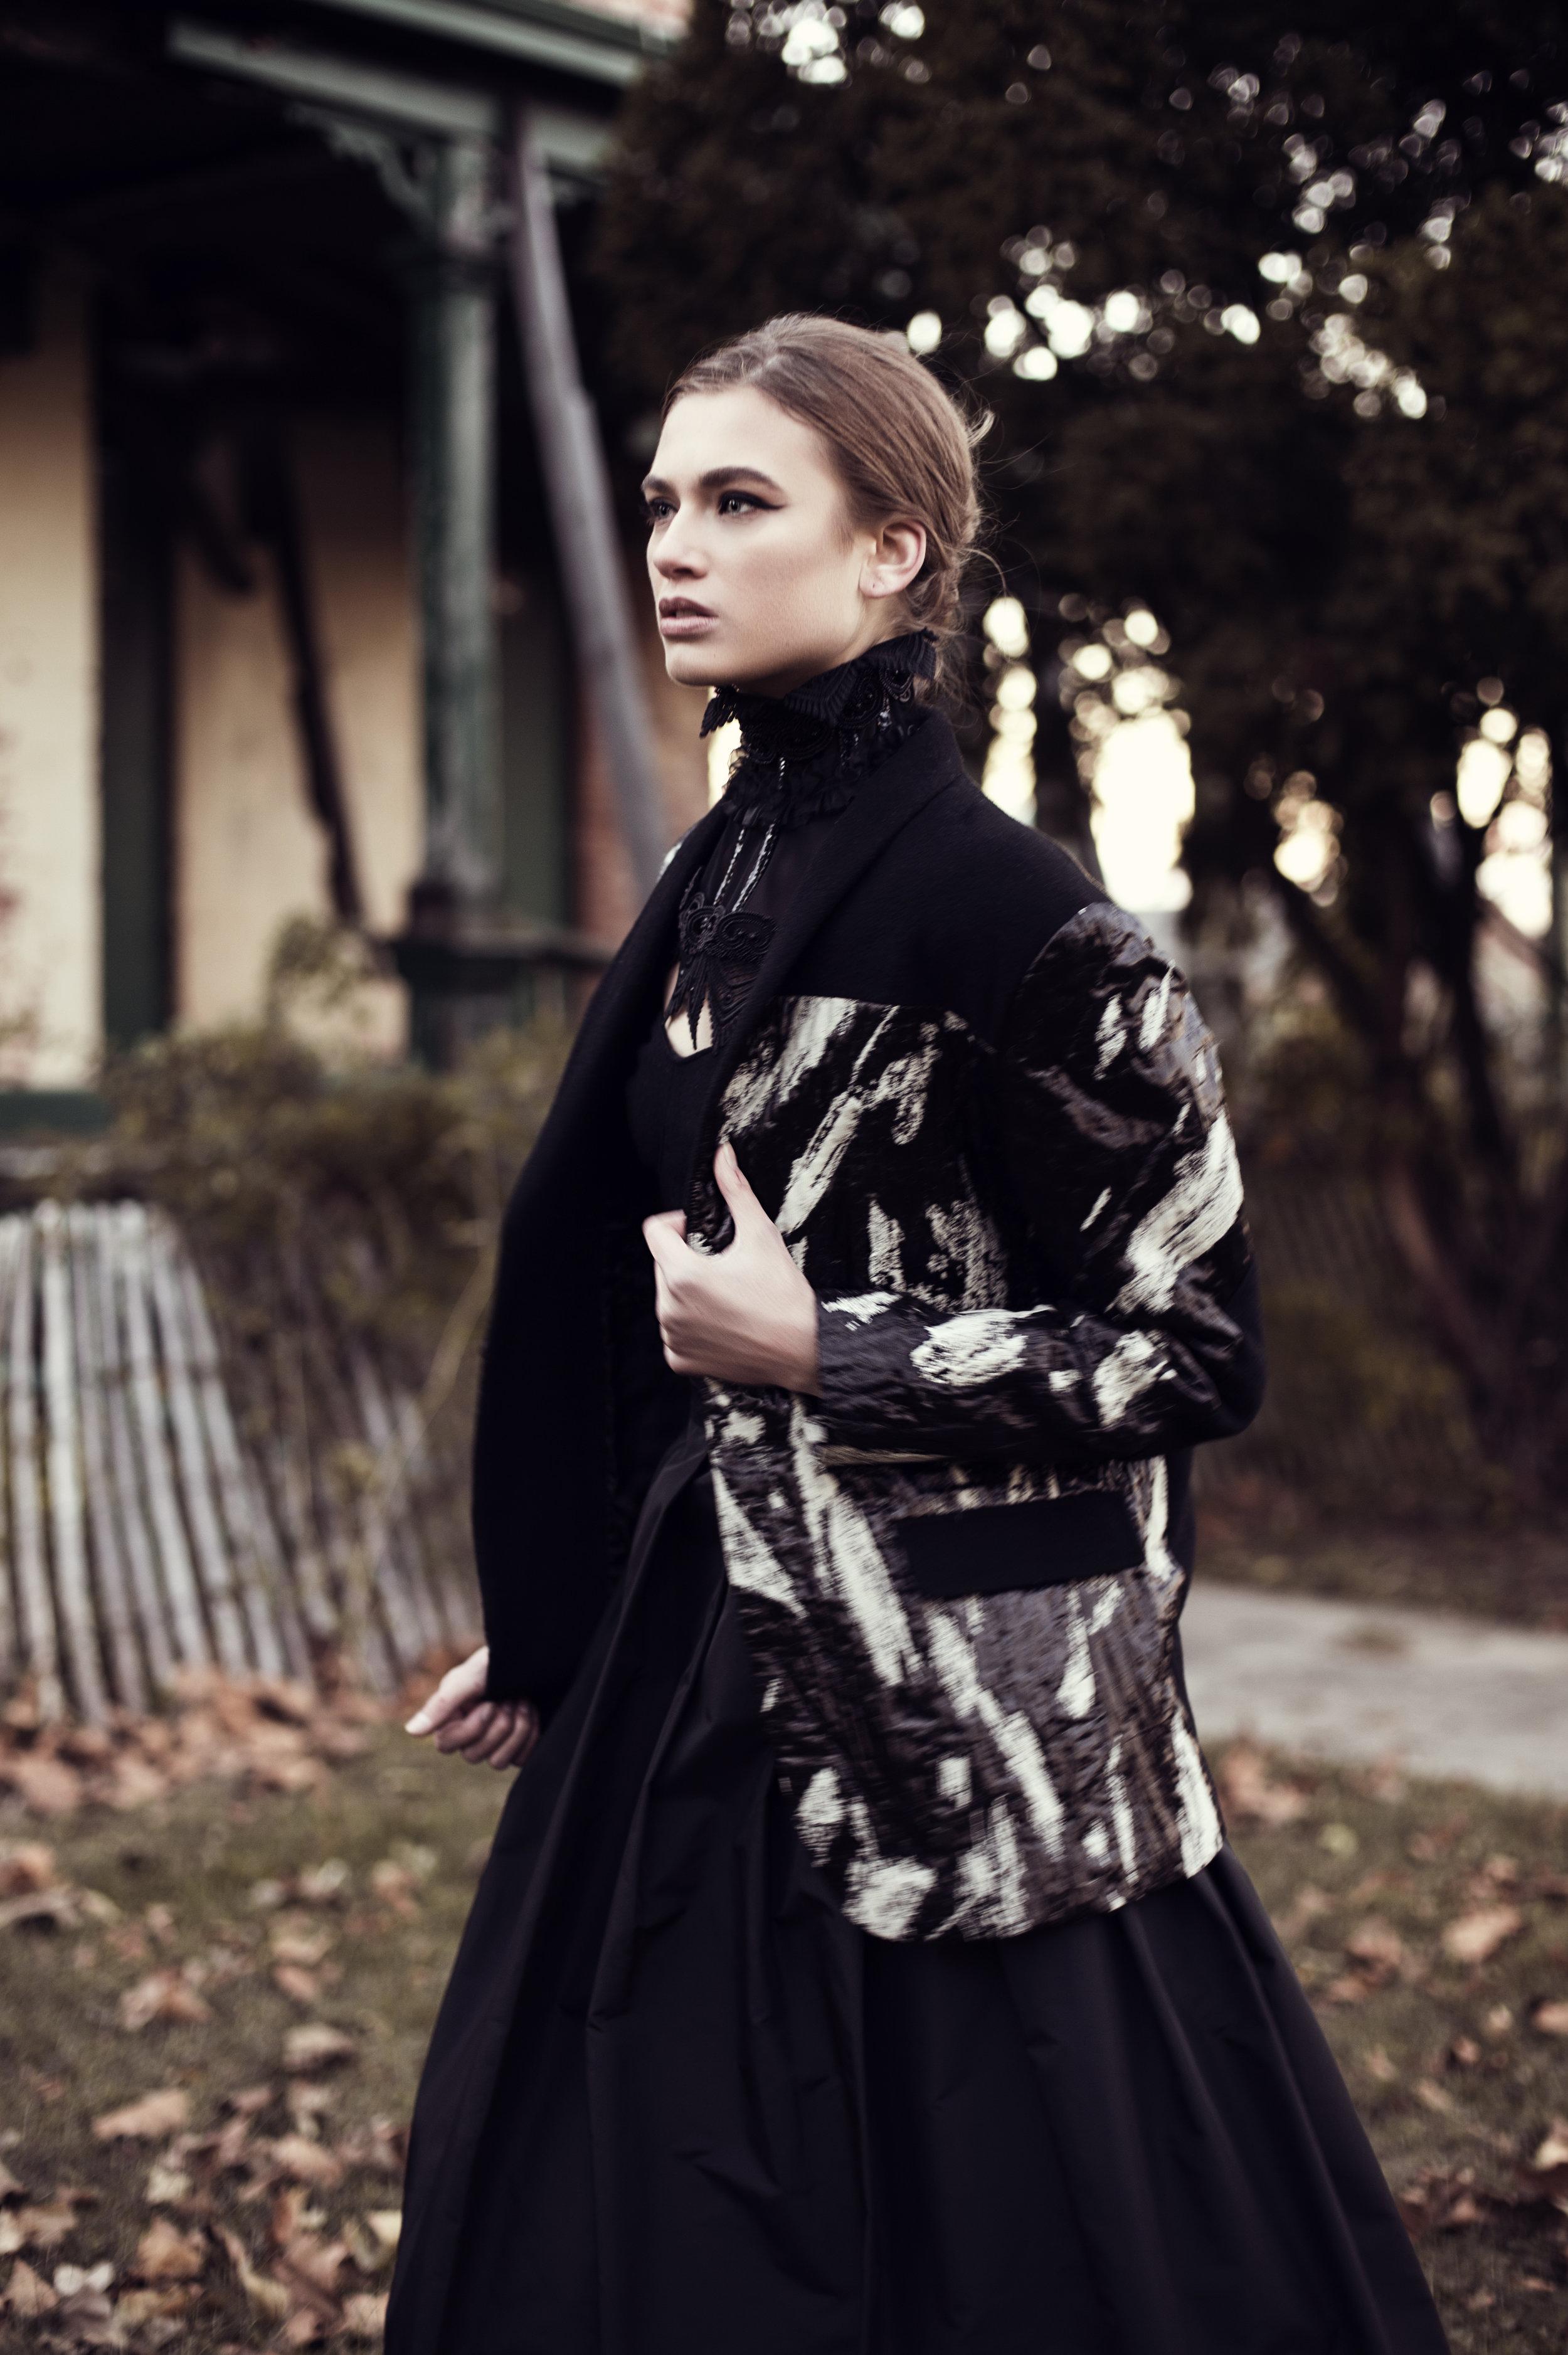 Neck piece: Veritée Hill, Jacket: Vivienne Hu, Top: Club Monaco, Skirt: Yvette Creation Paris